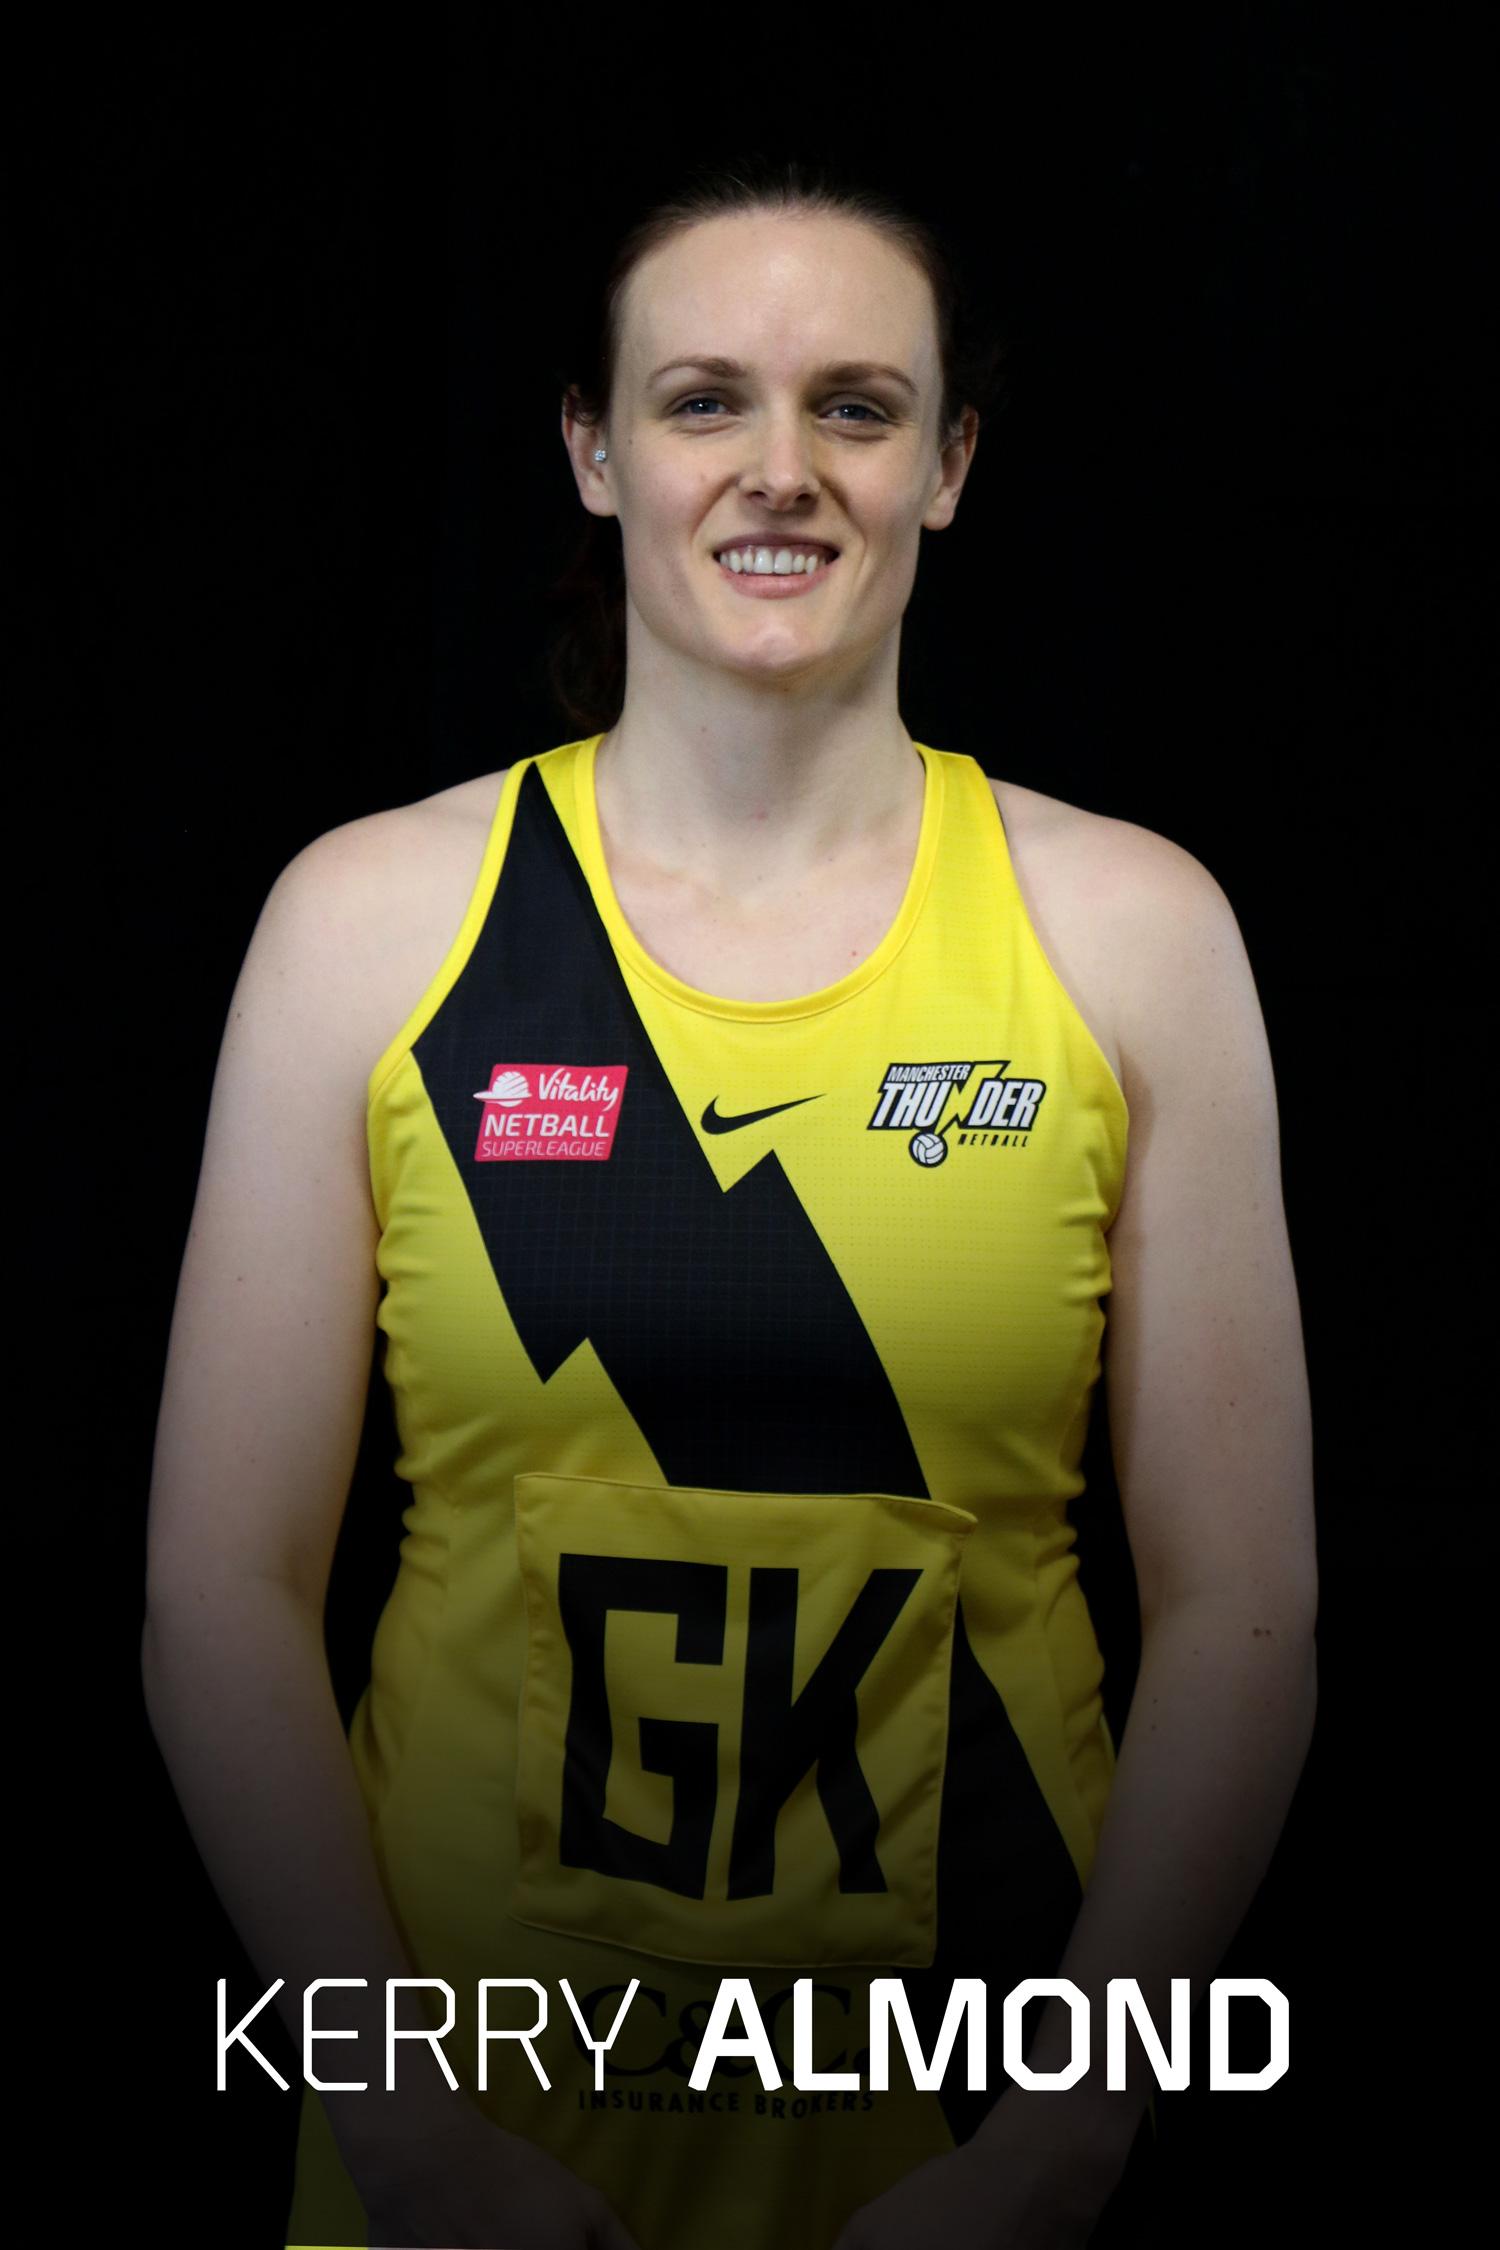 Kerry Almond